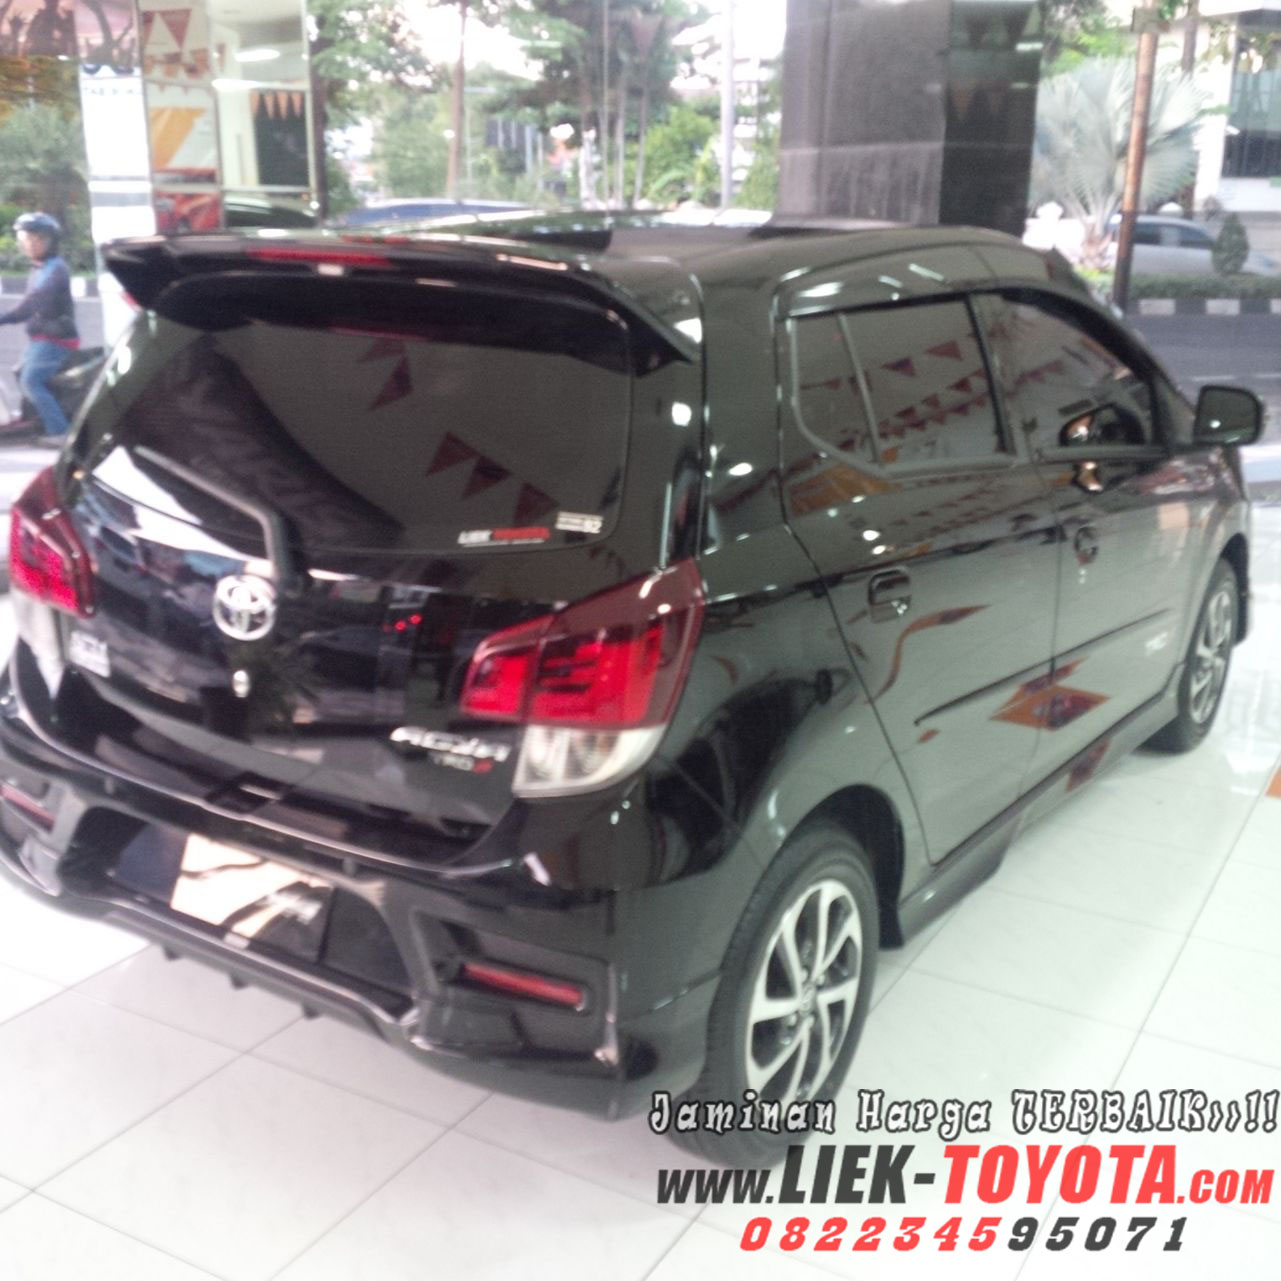 Harga Toyota AGYA Liek Toyota Hub 082234595071